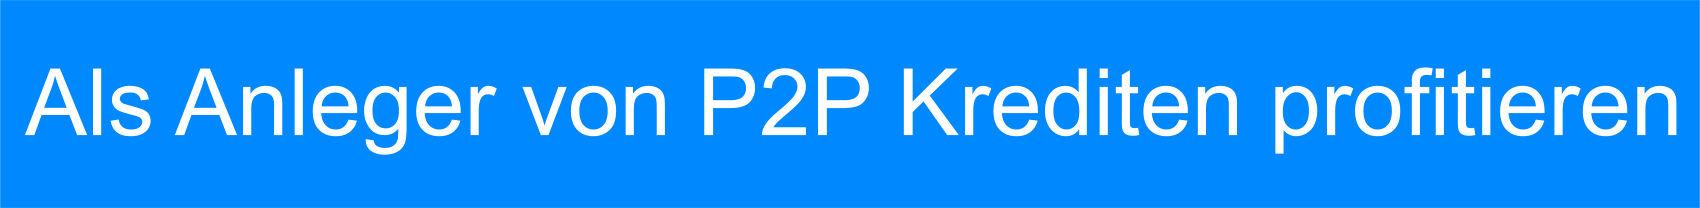 P2P Kredite Geld anlegen